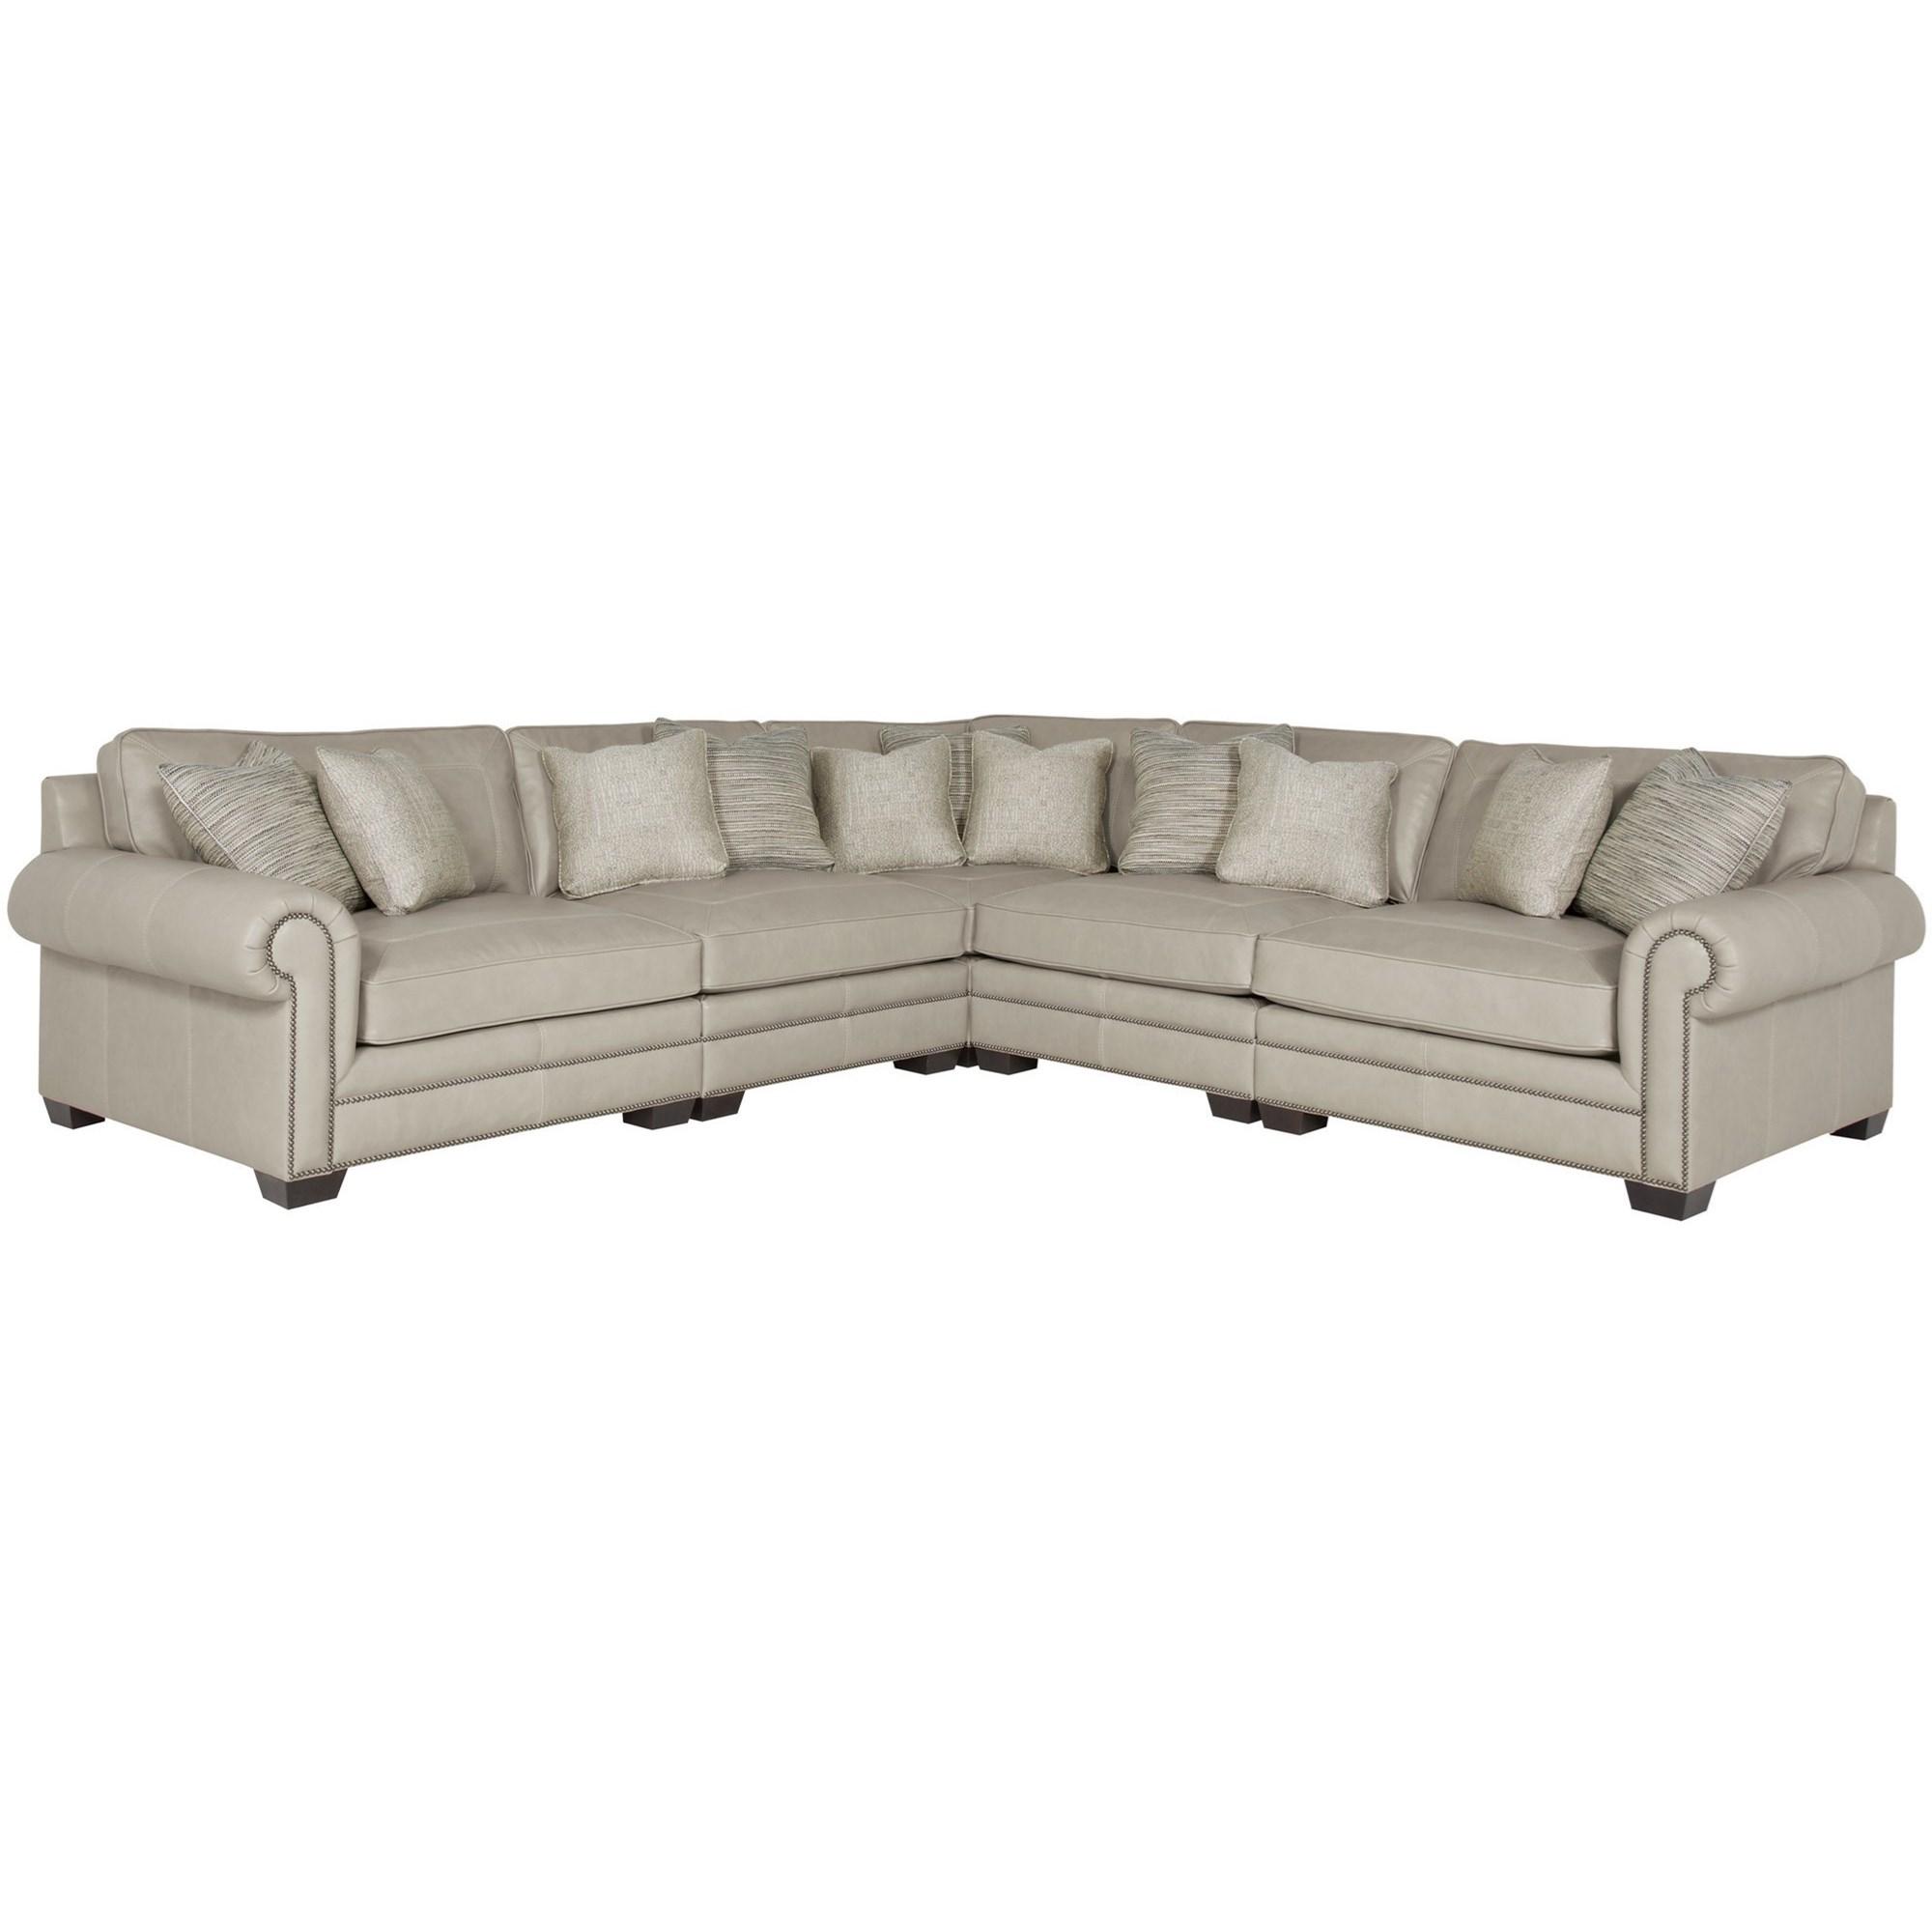 Bernhardt Grandview   Interiors Transitional Sectional Sofa With Nailhead  Trim